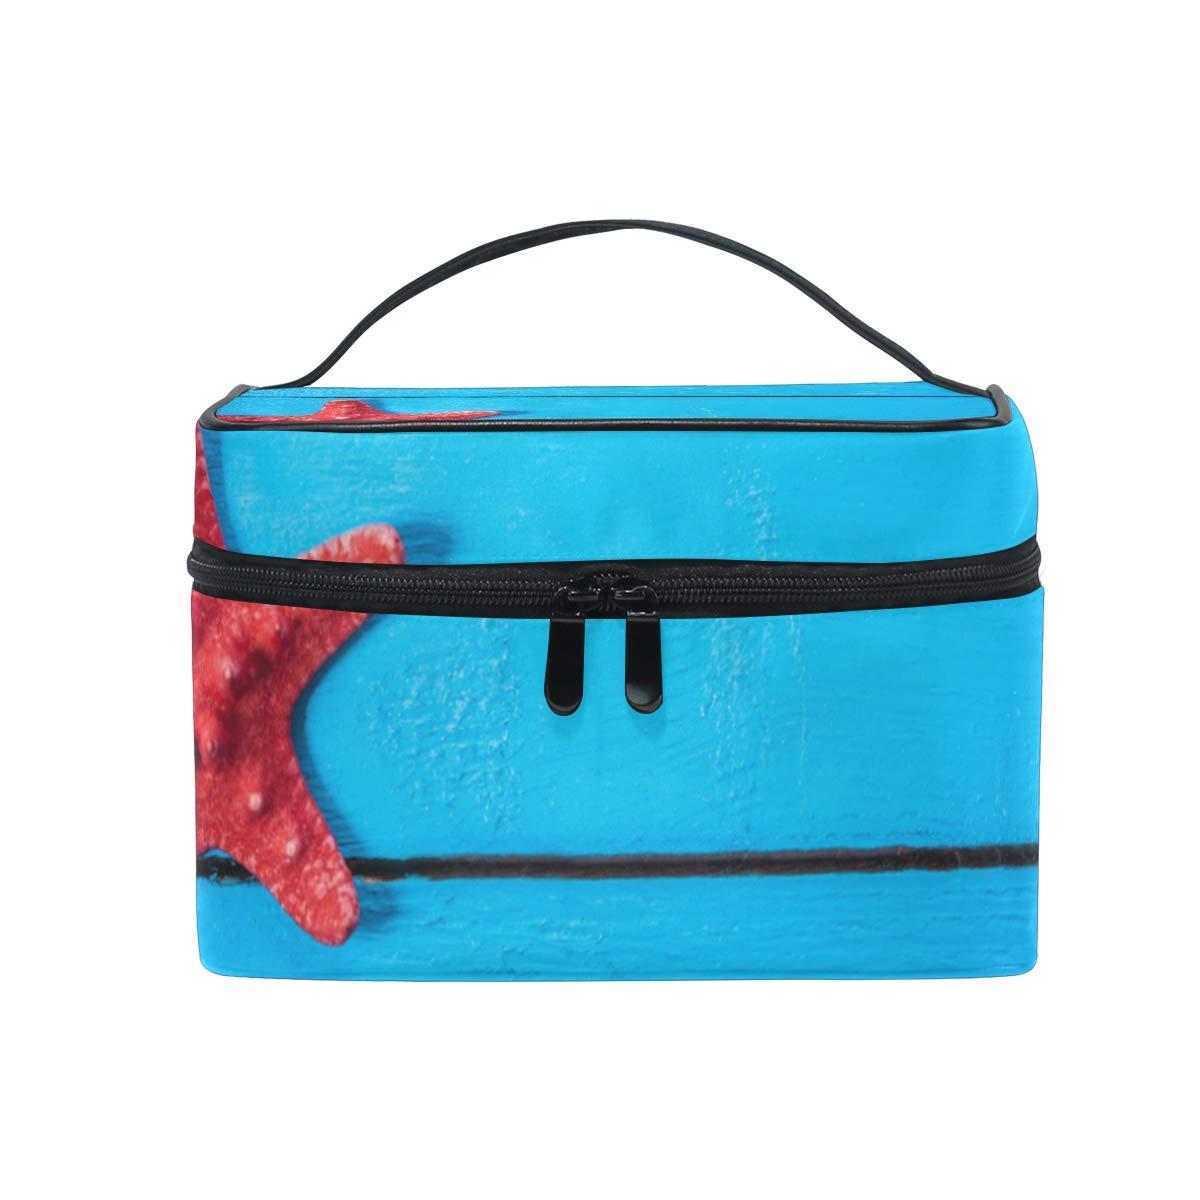 Summer Beach Scene Makeup Case Versatile Portable Cosmetic Bag Travel Hanging Toiletry Pouch Organizer for Women Girls